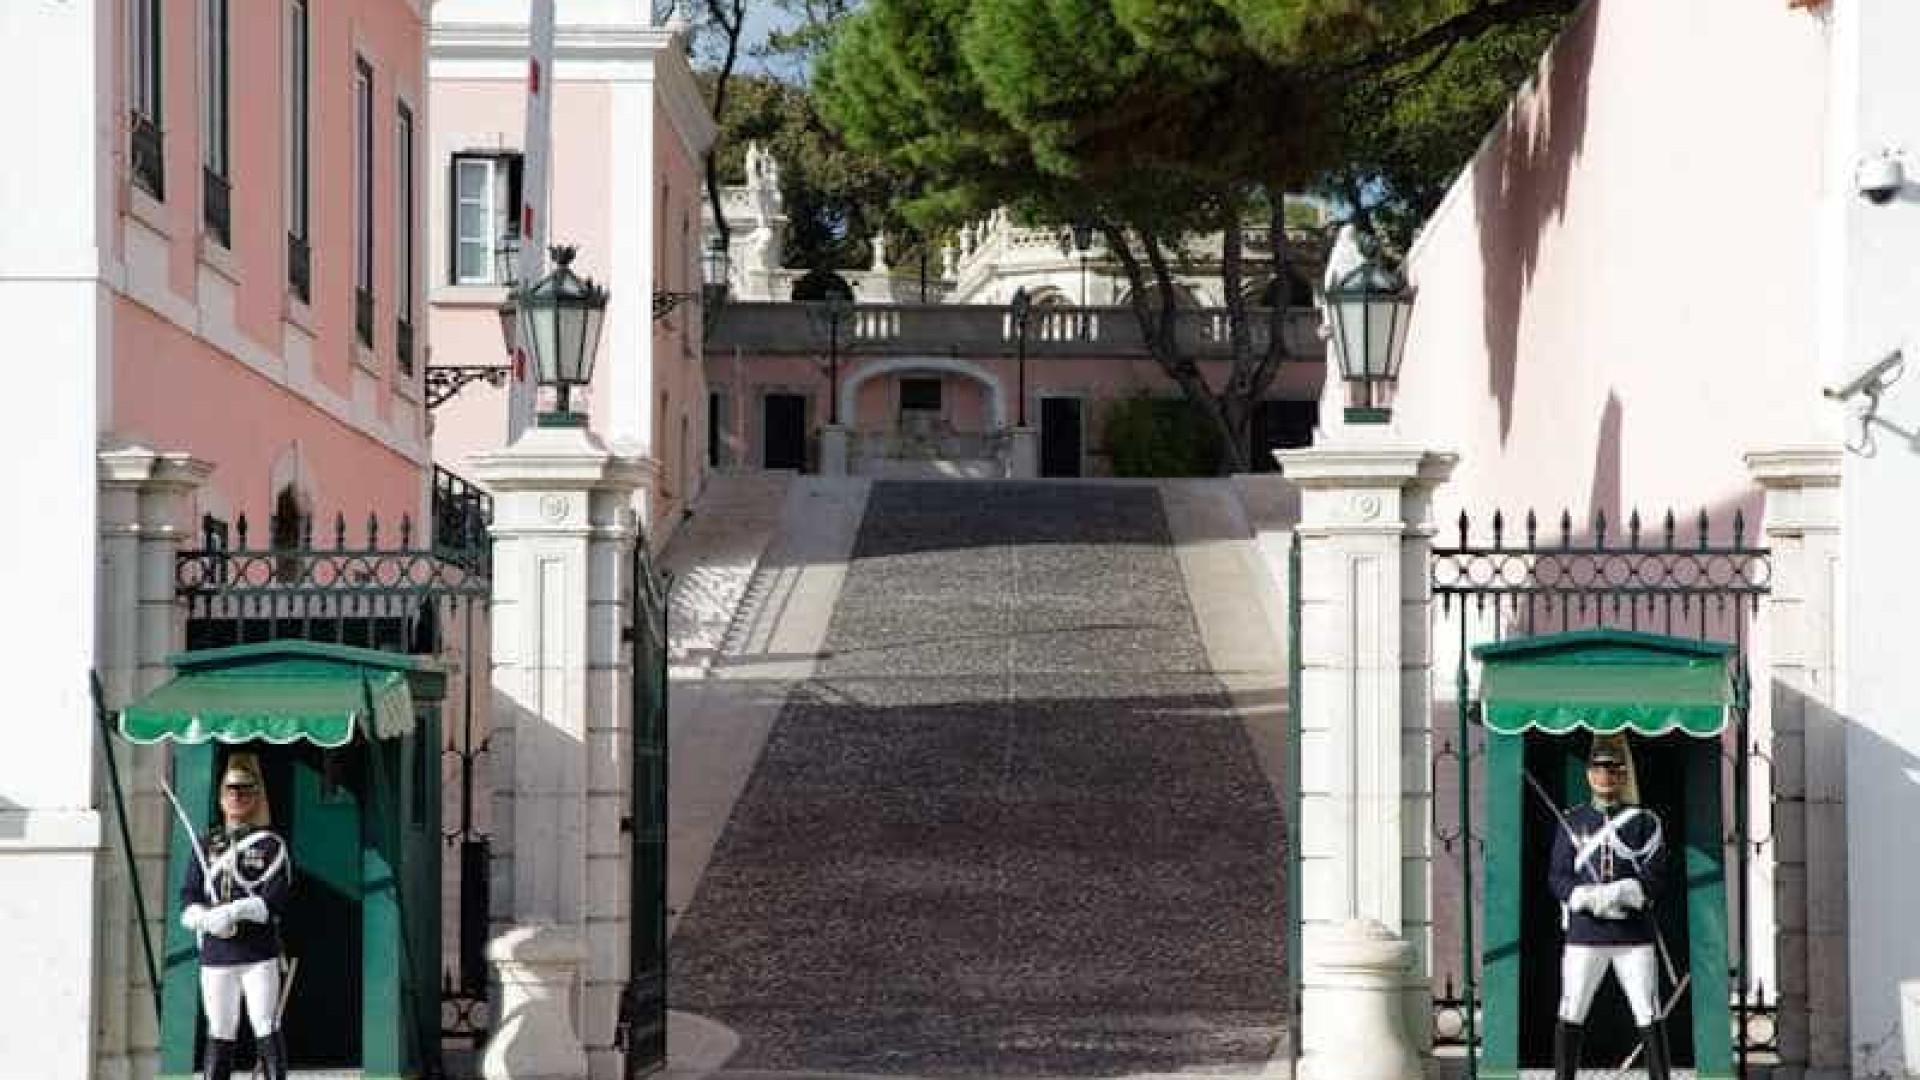 Danuta encerra programa deste ano de 'Escritores no Palácio' de Belém